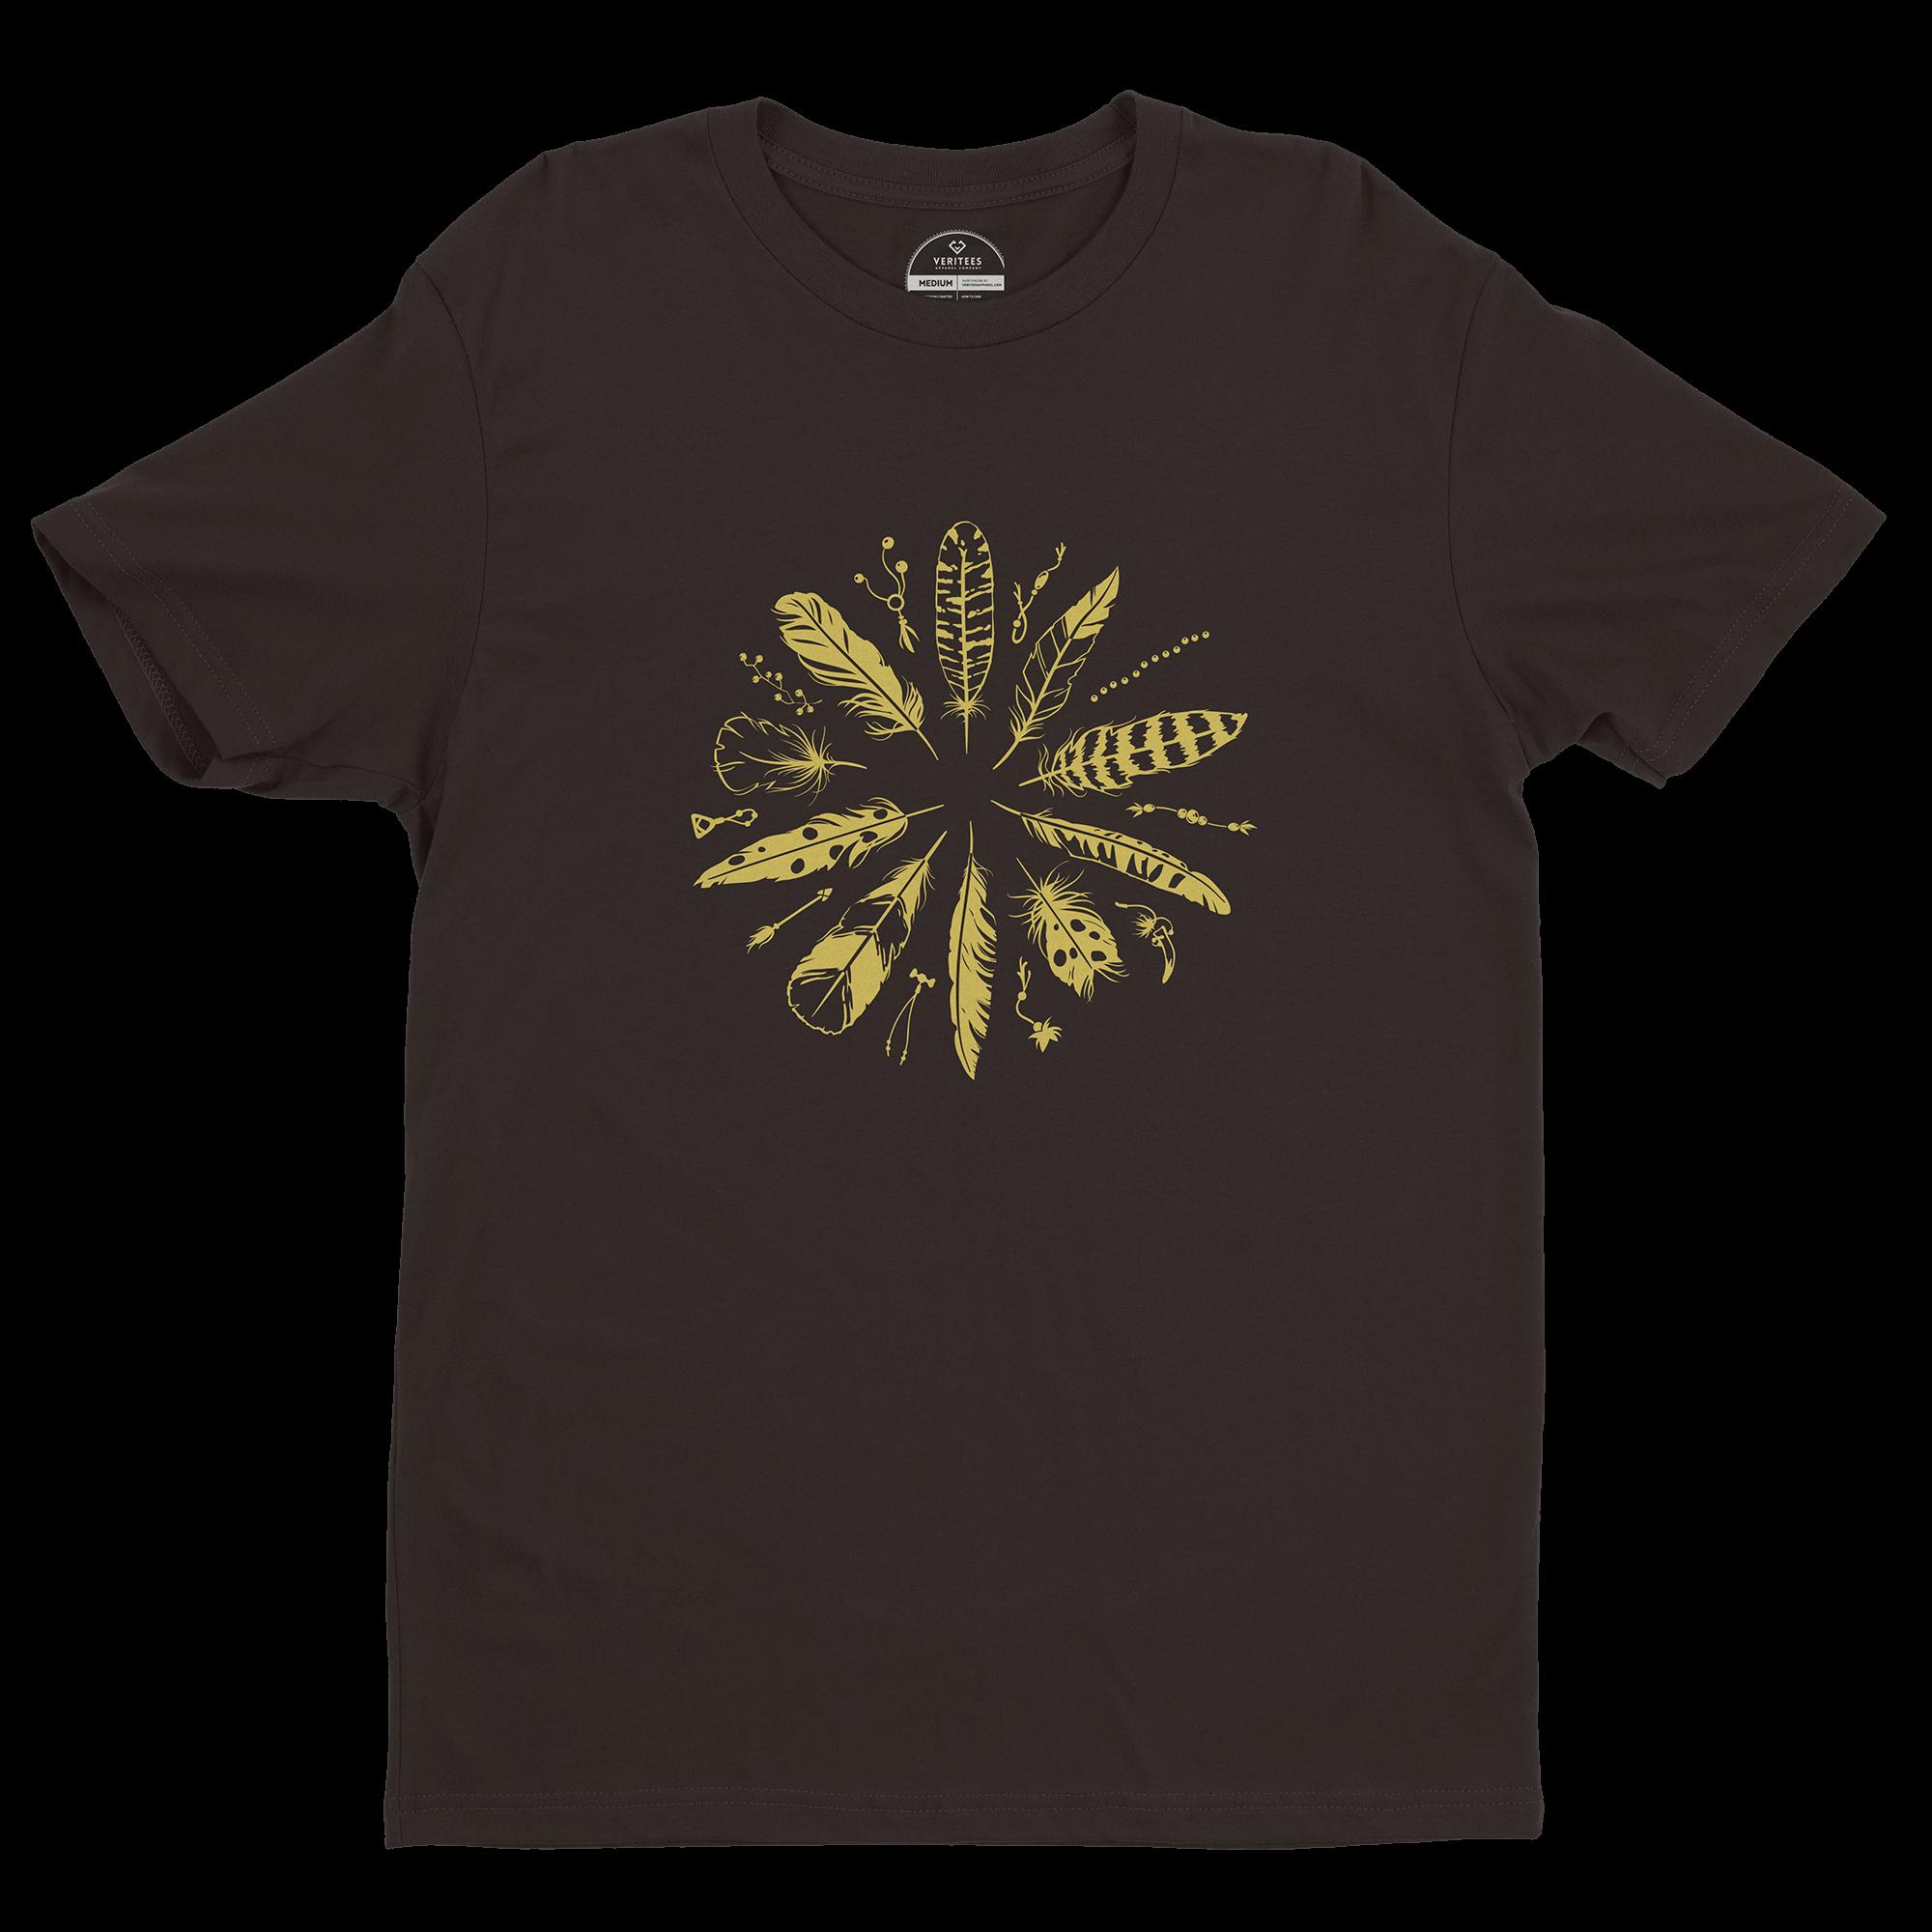 Medicine Shield Tee conspiracy t-shirt